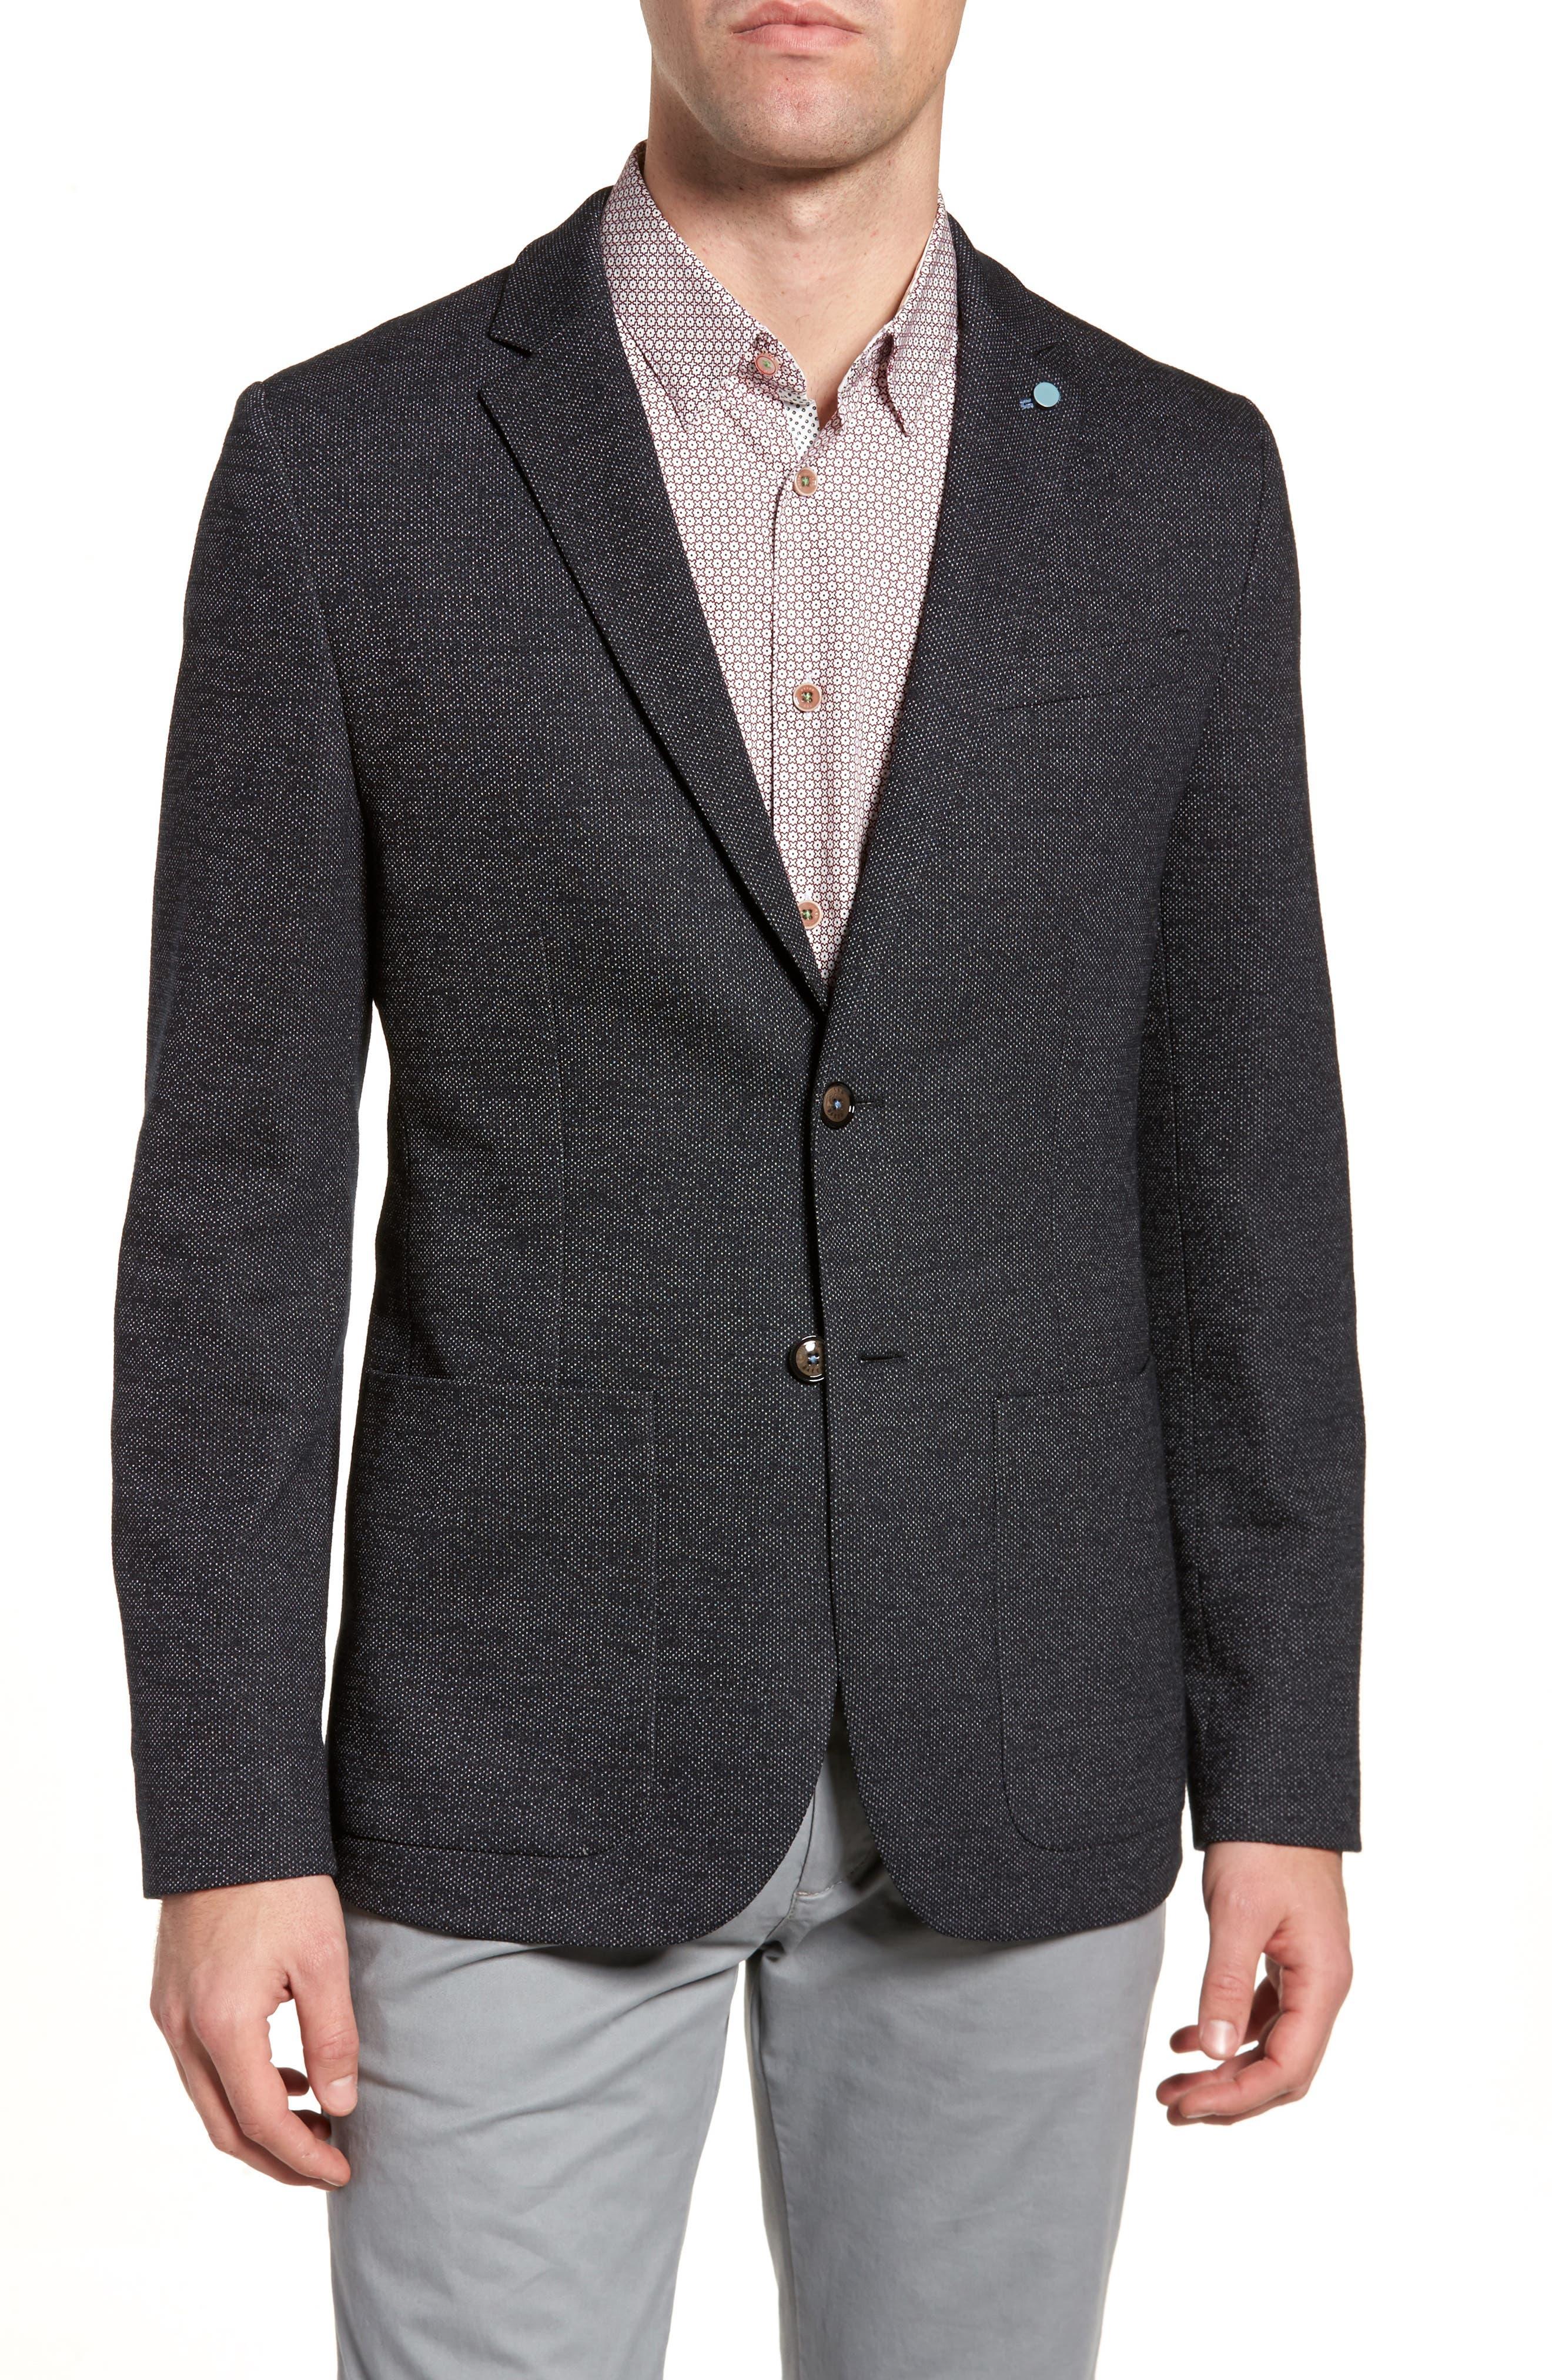 Elek Trim Fit Blazer,                         Main,                         color, Charcoal